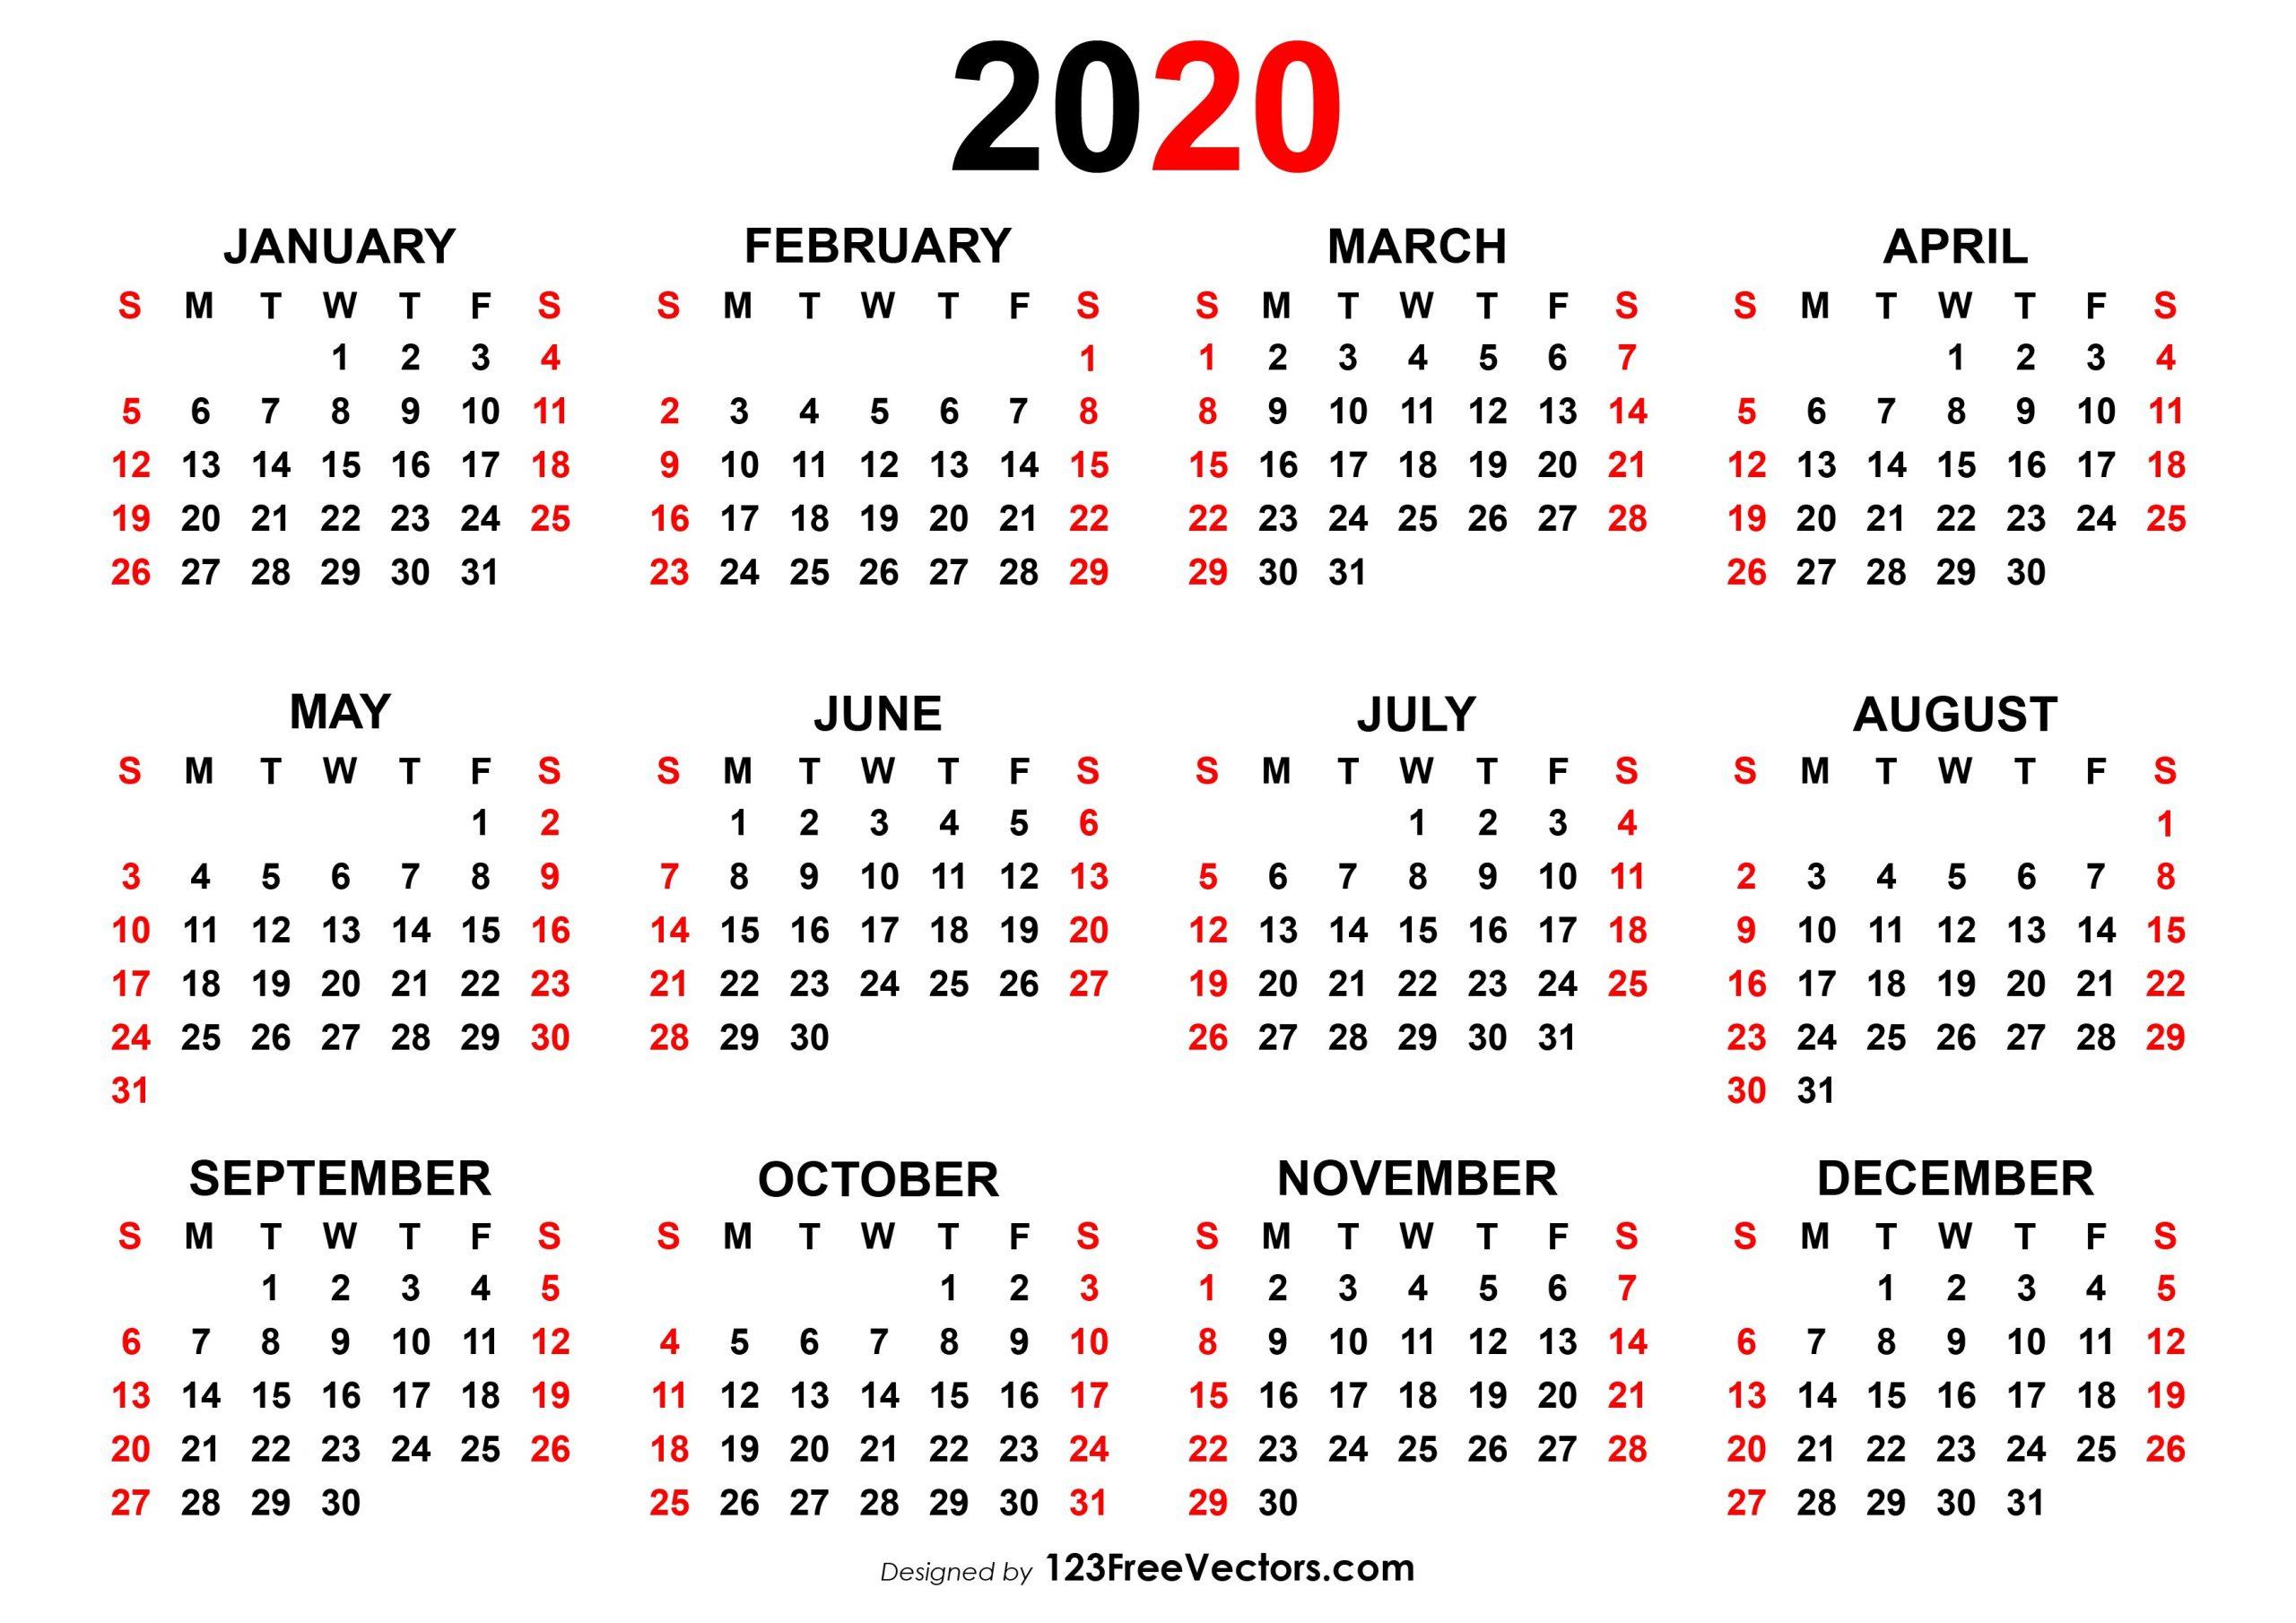 4 Year Calendar 2020 To 2020 | Calendar Printables Free Free 4 Year Calendar Printable